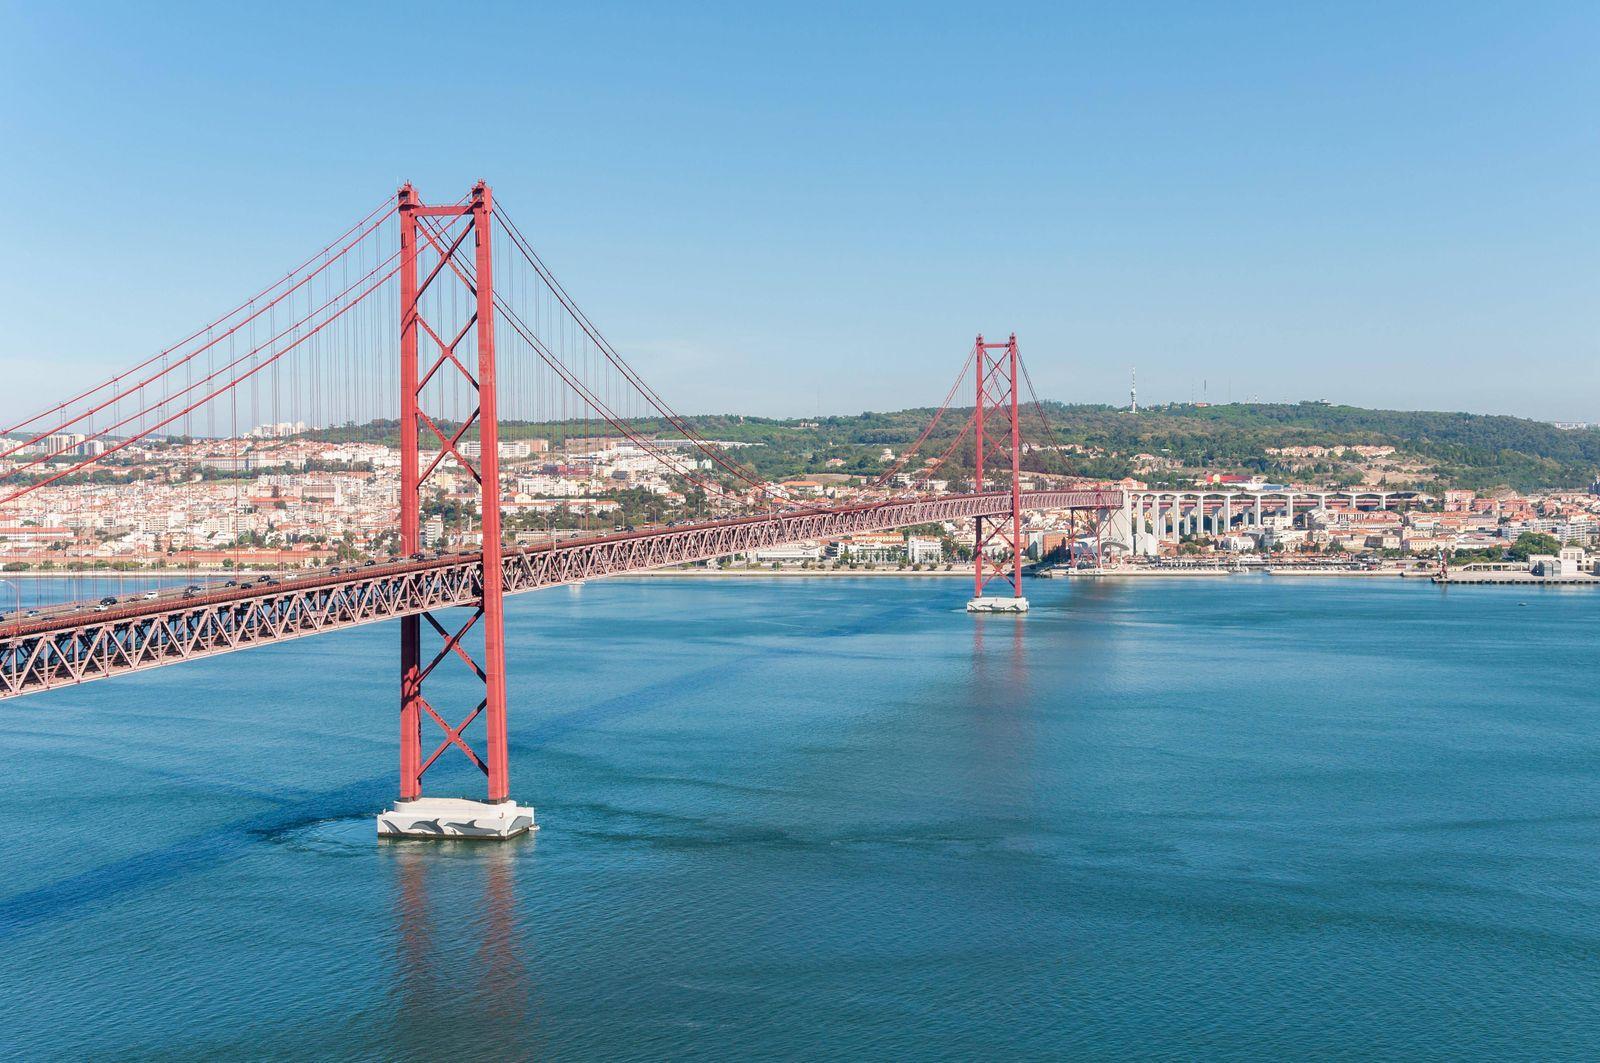 suspension bridge in lisbon PUBLICATIONxINxGERxSUIxAUTxONLY Copyright xmkos83x Panthermedia12463786